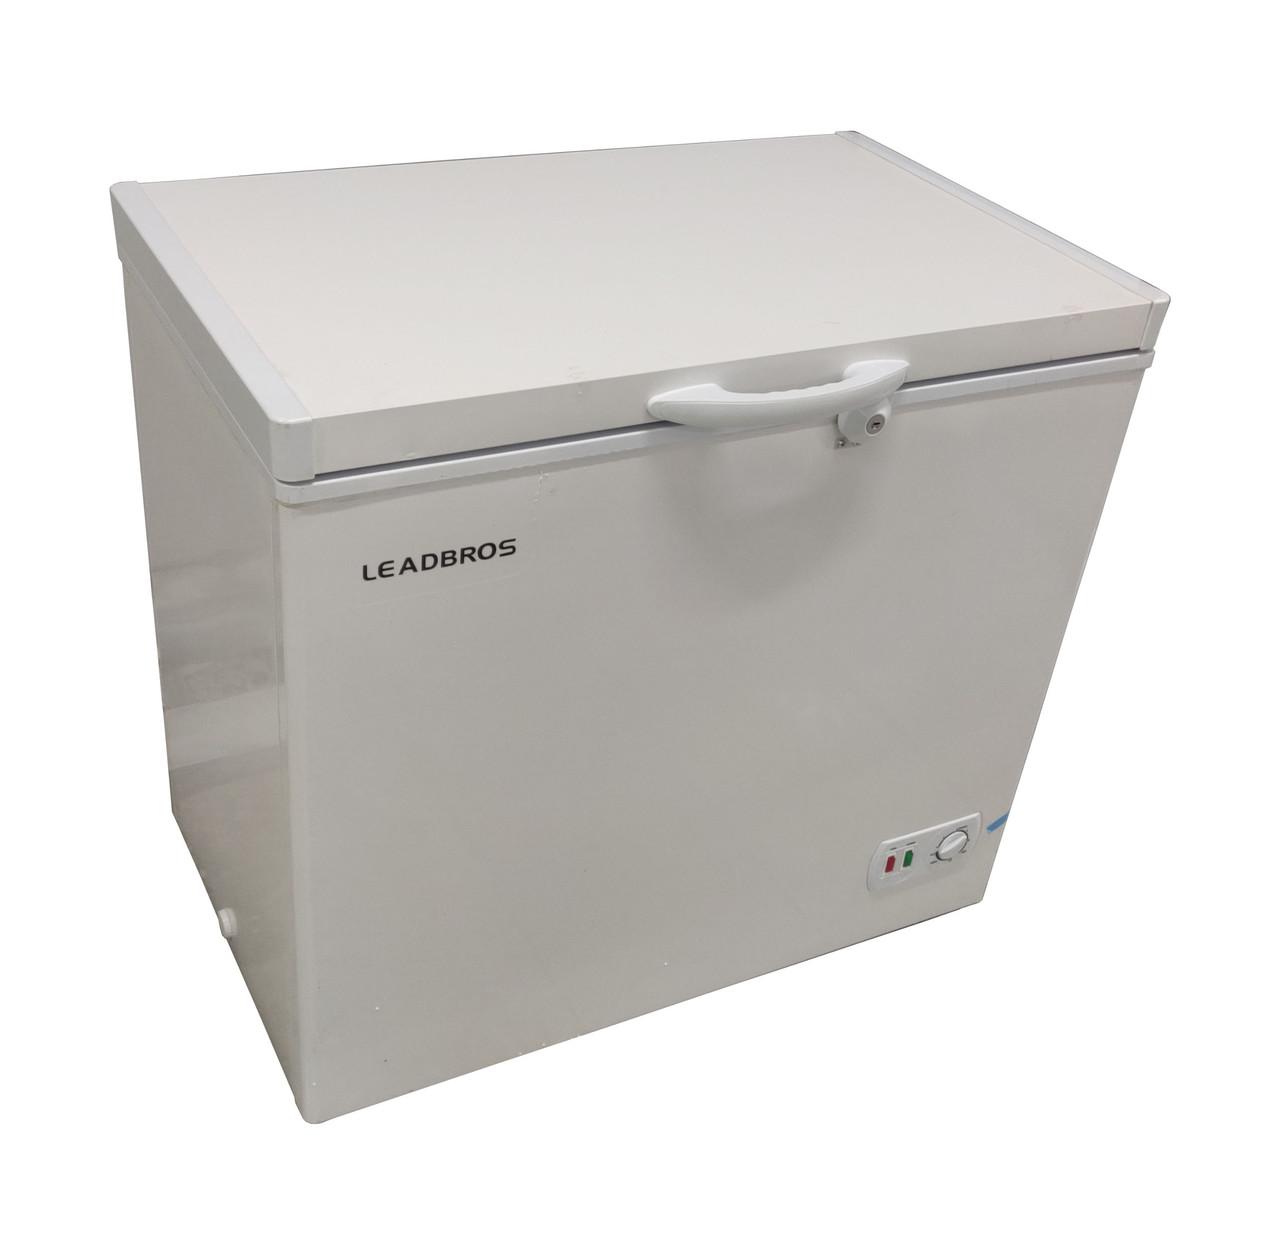 Морозильный ларь leadbros BC/BD 210K